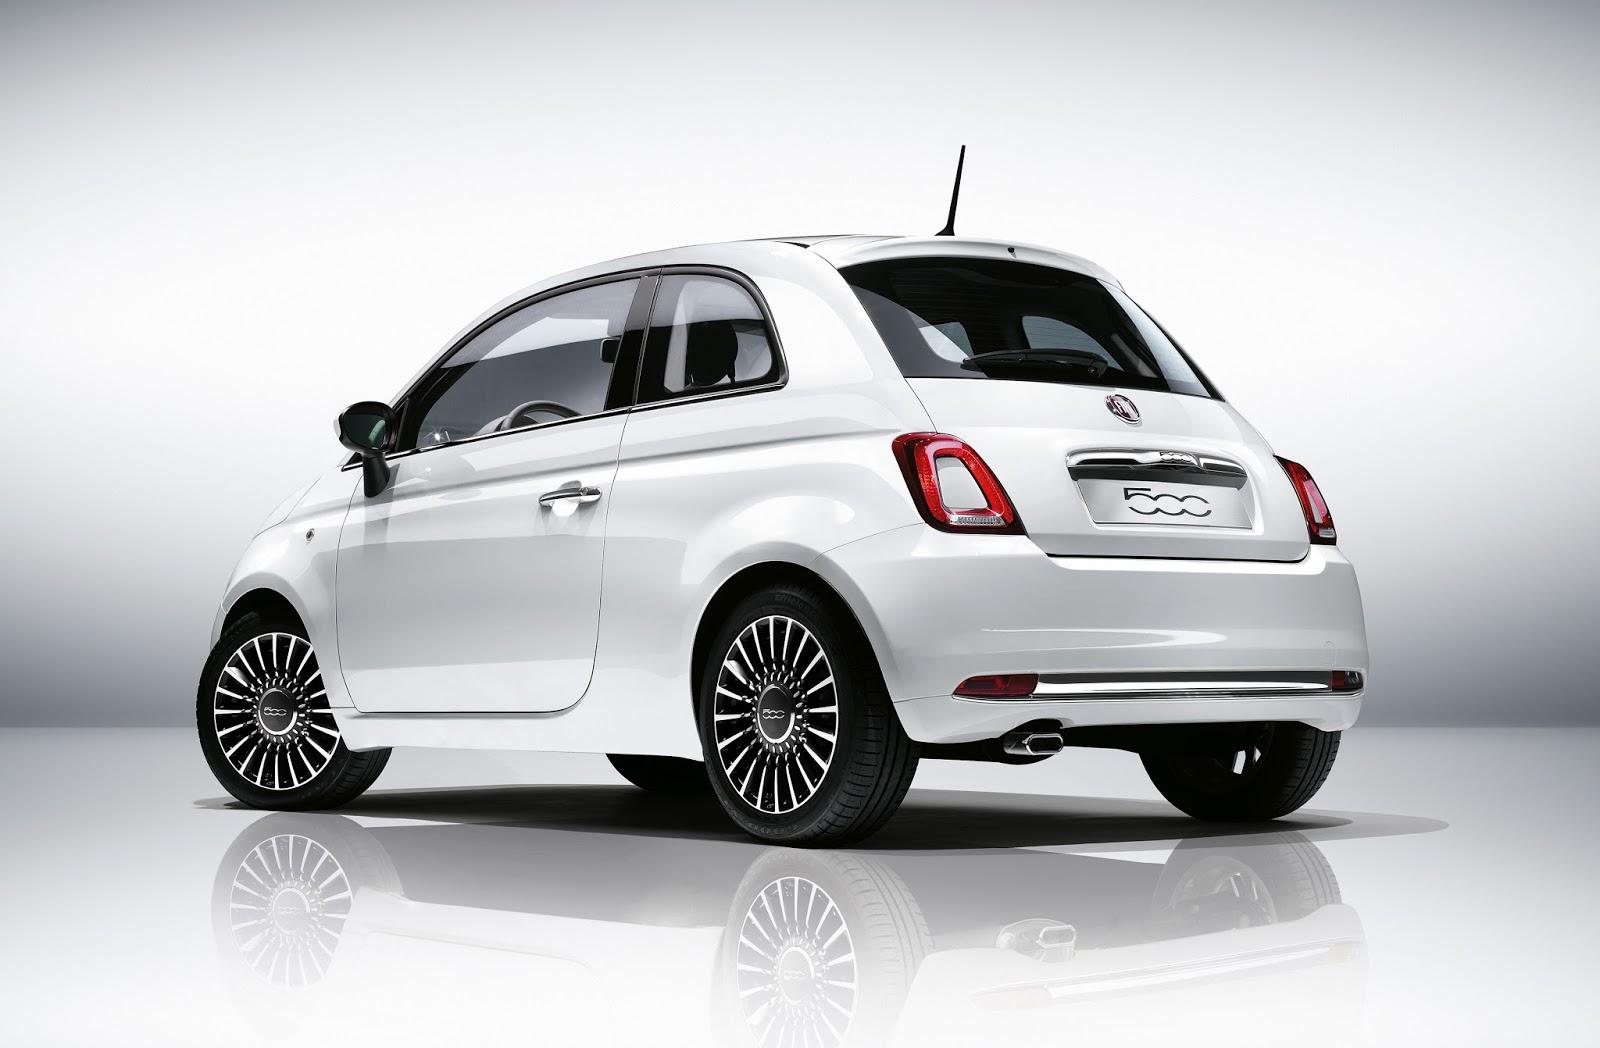 150703 FIAT Nuova 500 21 Η άφιξη του νέου Fiat 500 είναι γεγονός